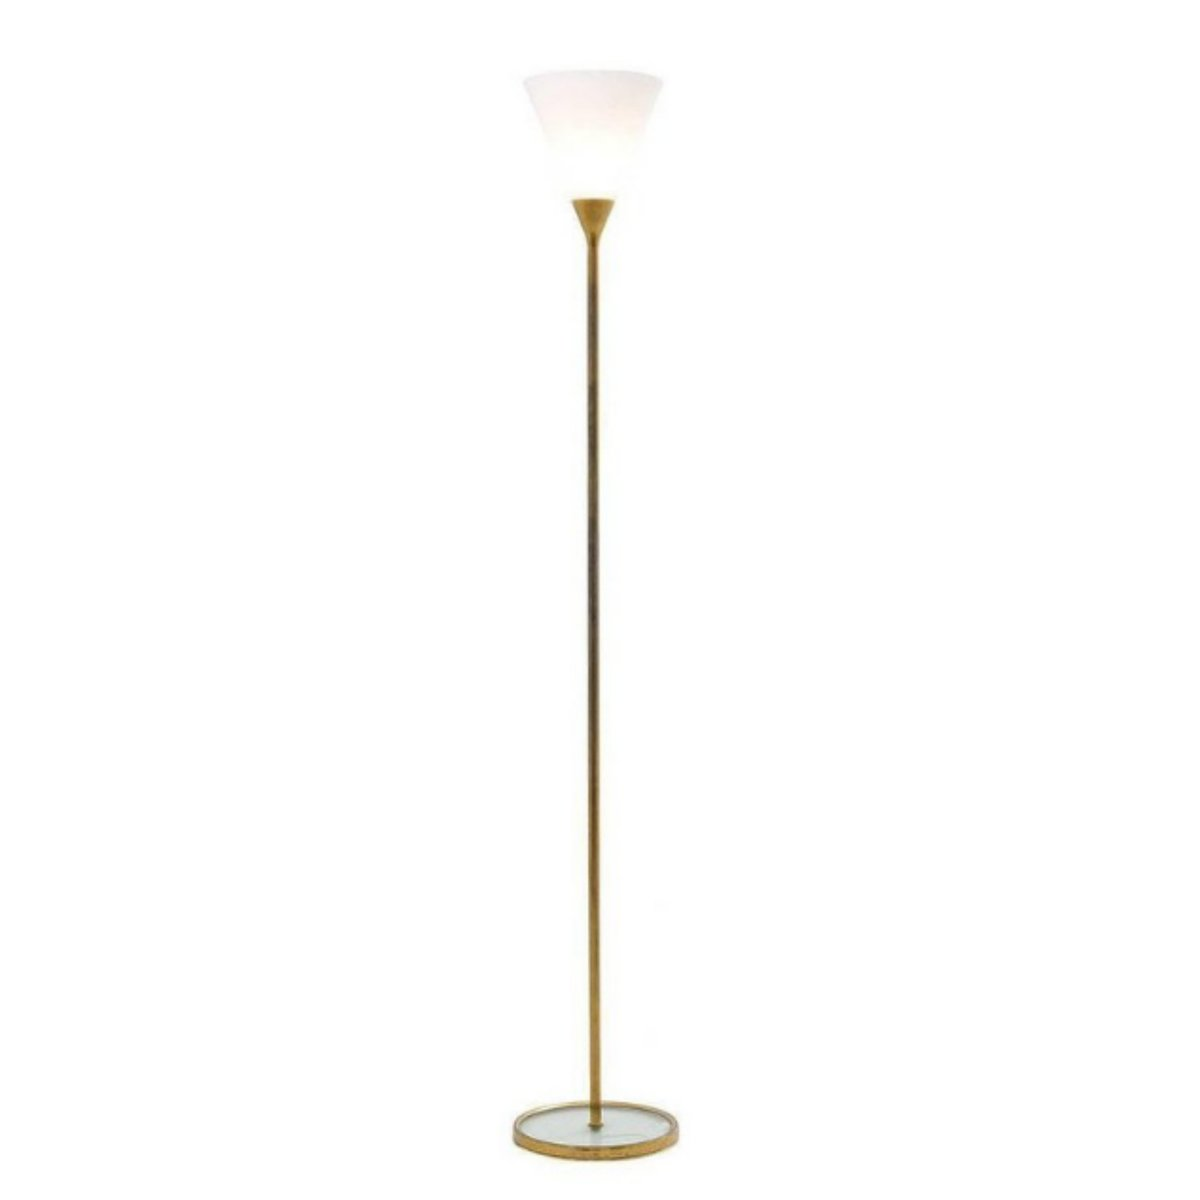 2003 stehlampe von max ingrand f r fontana arte 1950er bei pamono kaufen. Black Bedroom Furniture Sets. Home Design Ideas